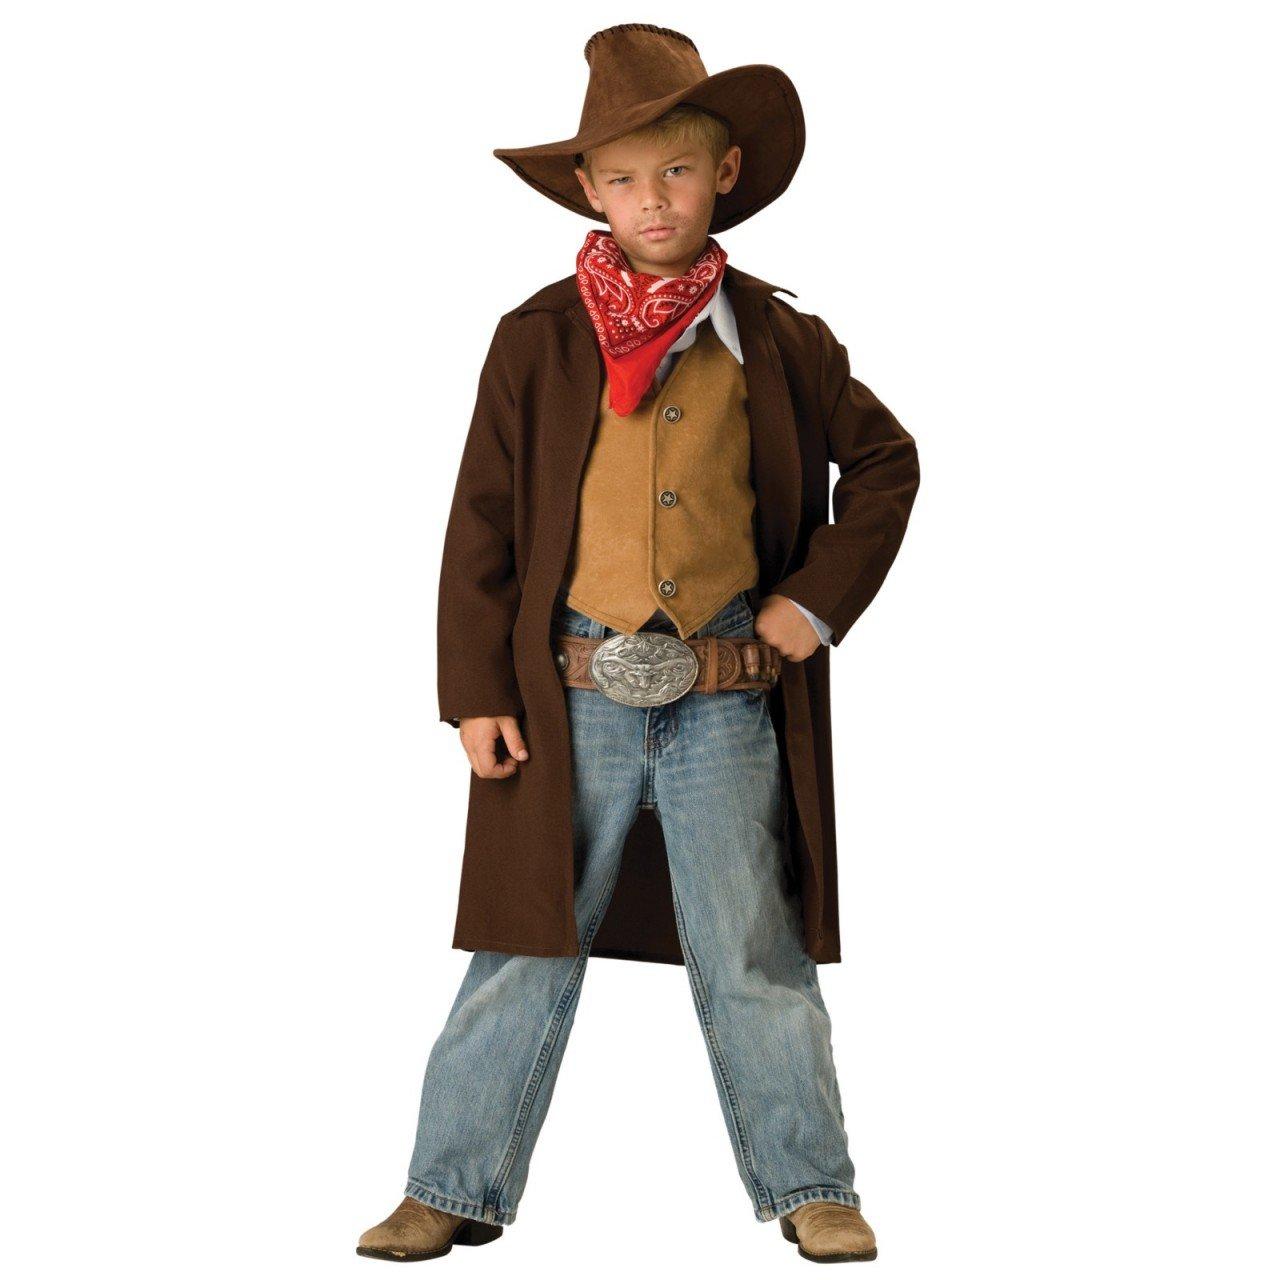 Fantasia Infantil Masculina Cowboy Renegado Velho Oeste 55f6bf3c1c1